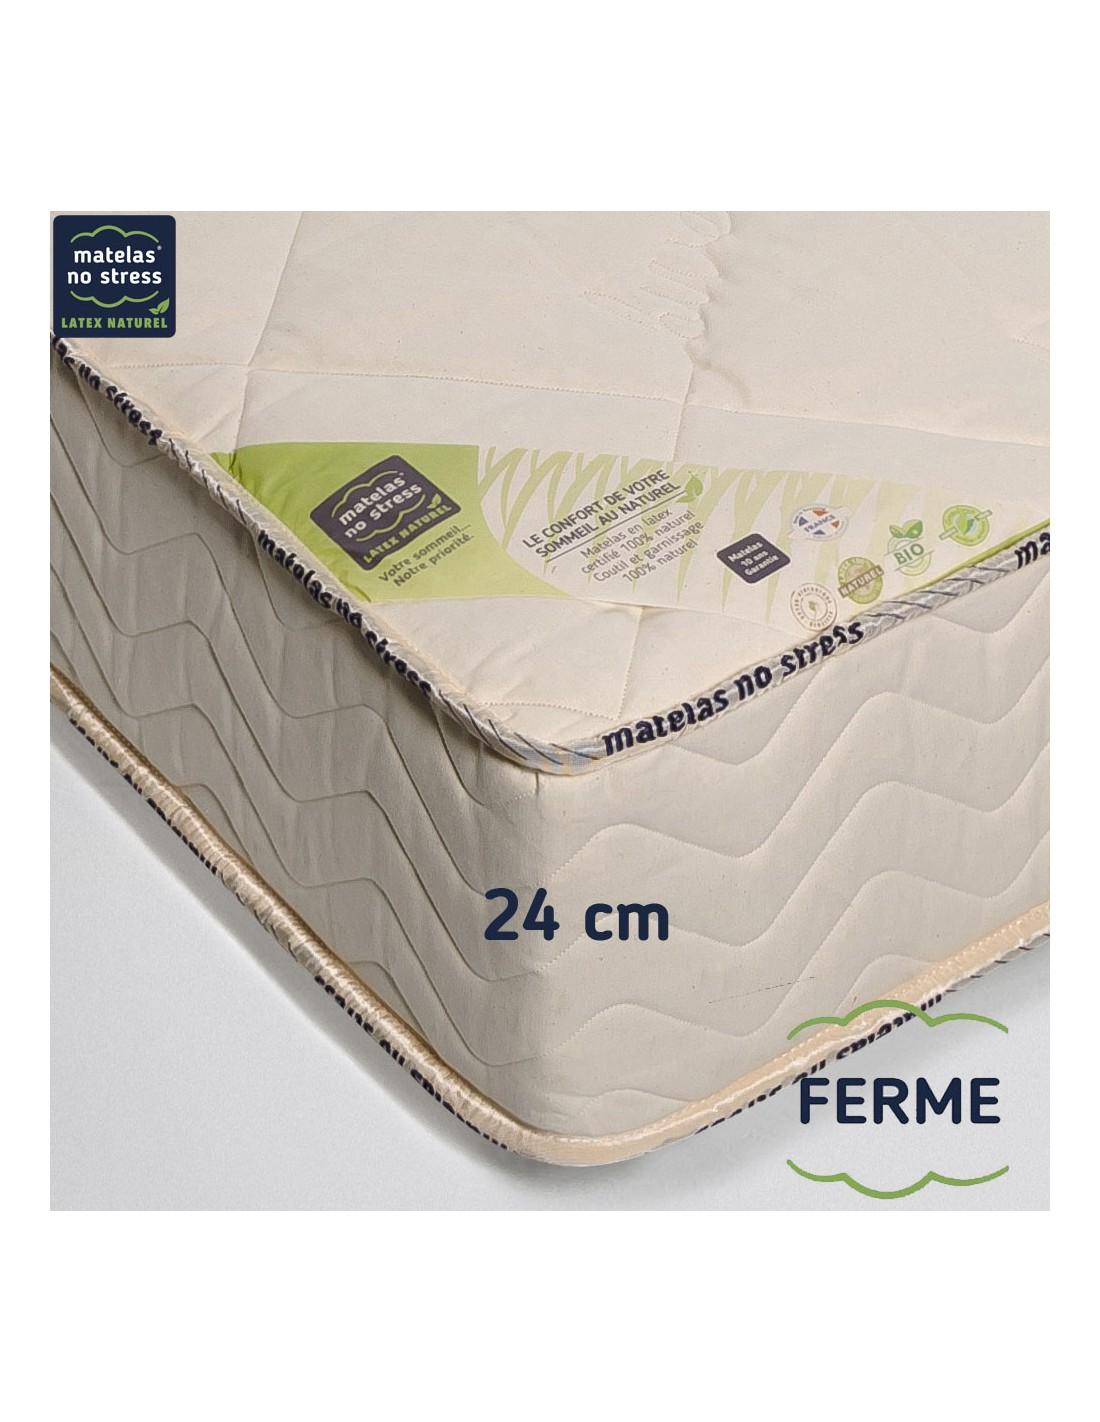 matelas latex bio naturel 80x200 prestige ferme 24 cm. Black Bedroom Furniture Sets. Home Design Ideas